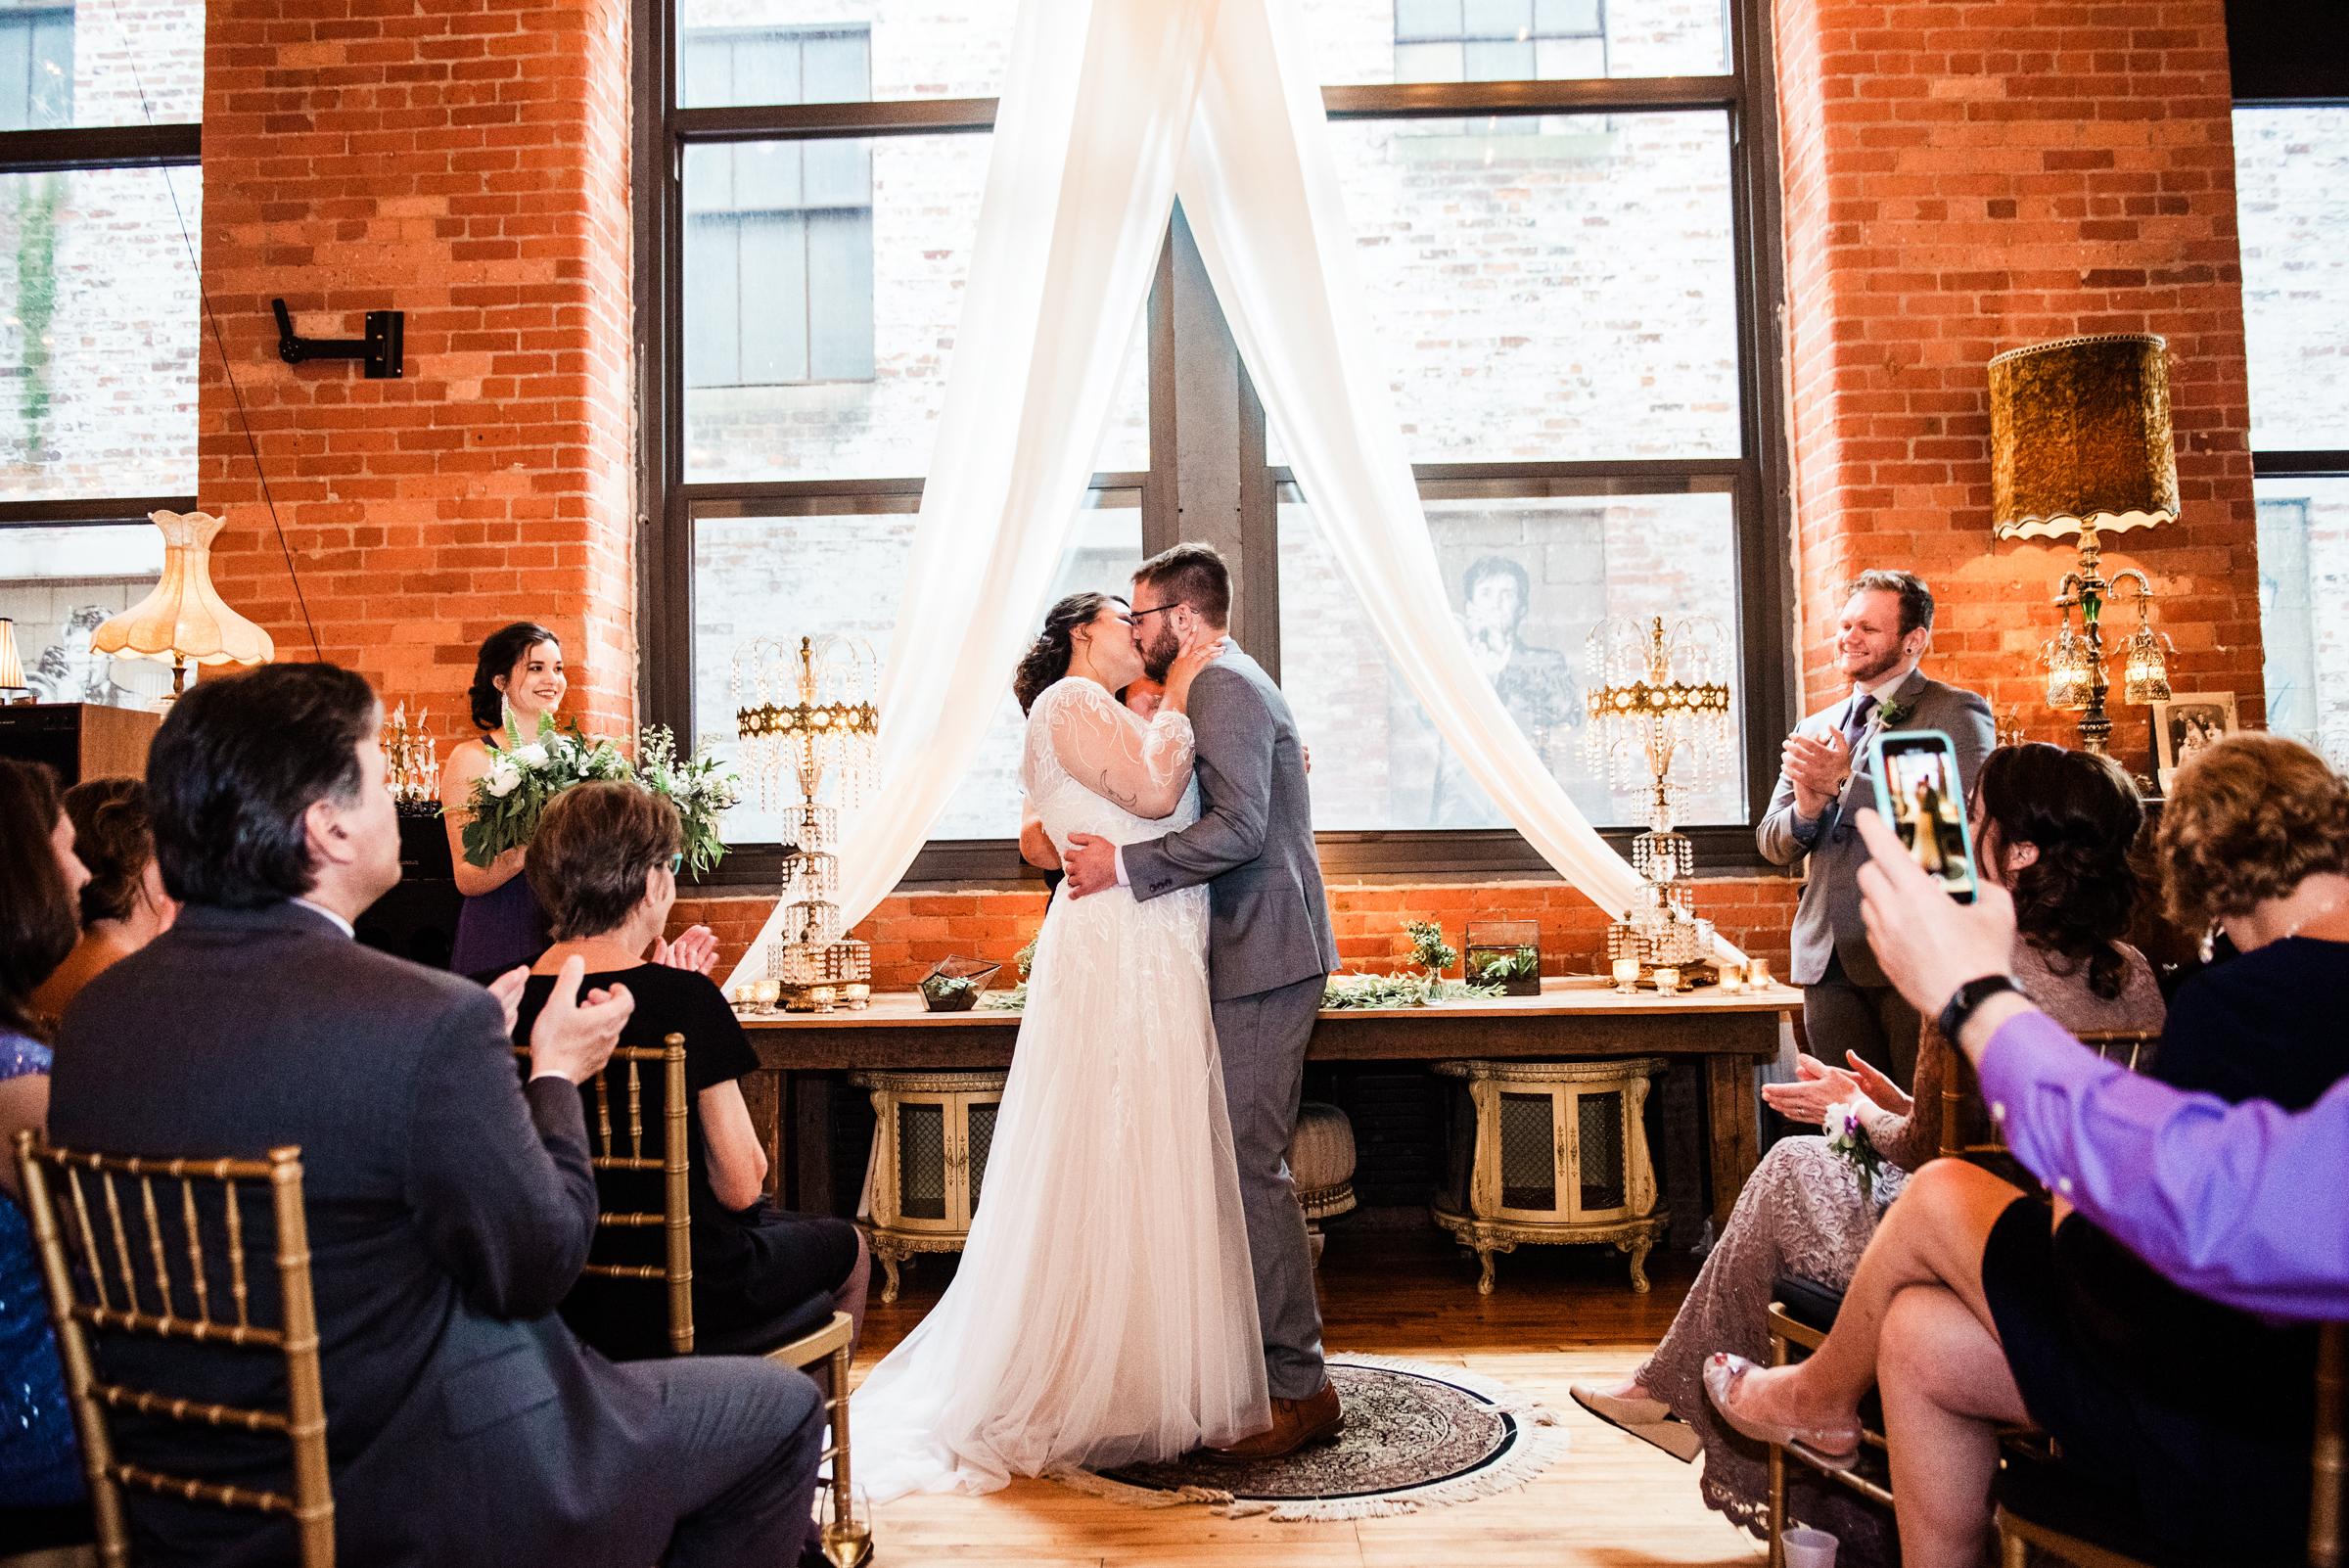 Studio_180_Lamberton_Conservatory_Rochester_Wedding_JILL_STUDIO_Rochester_NY_Photographer_DSC_8965.jpg